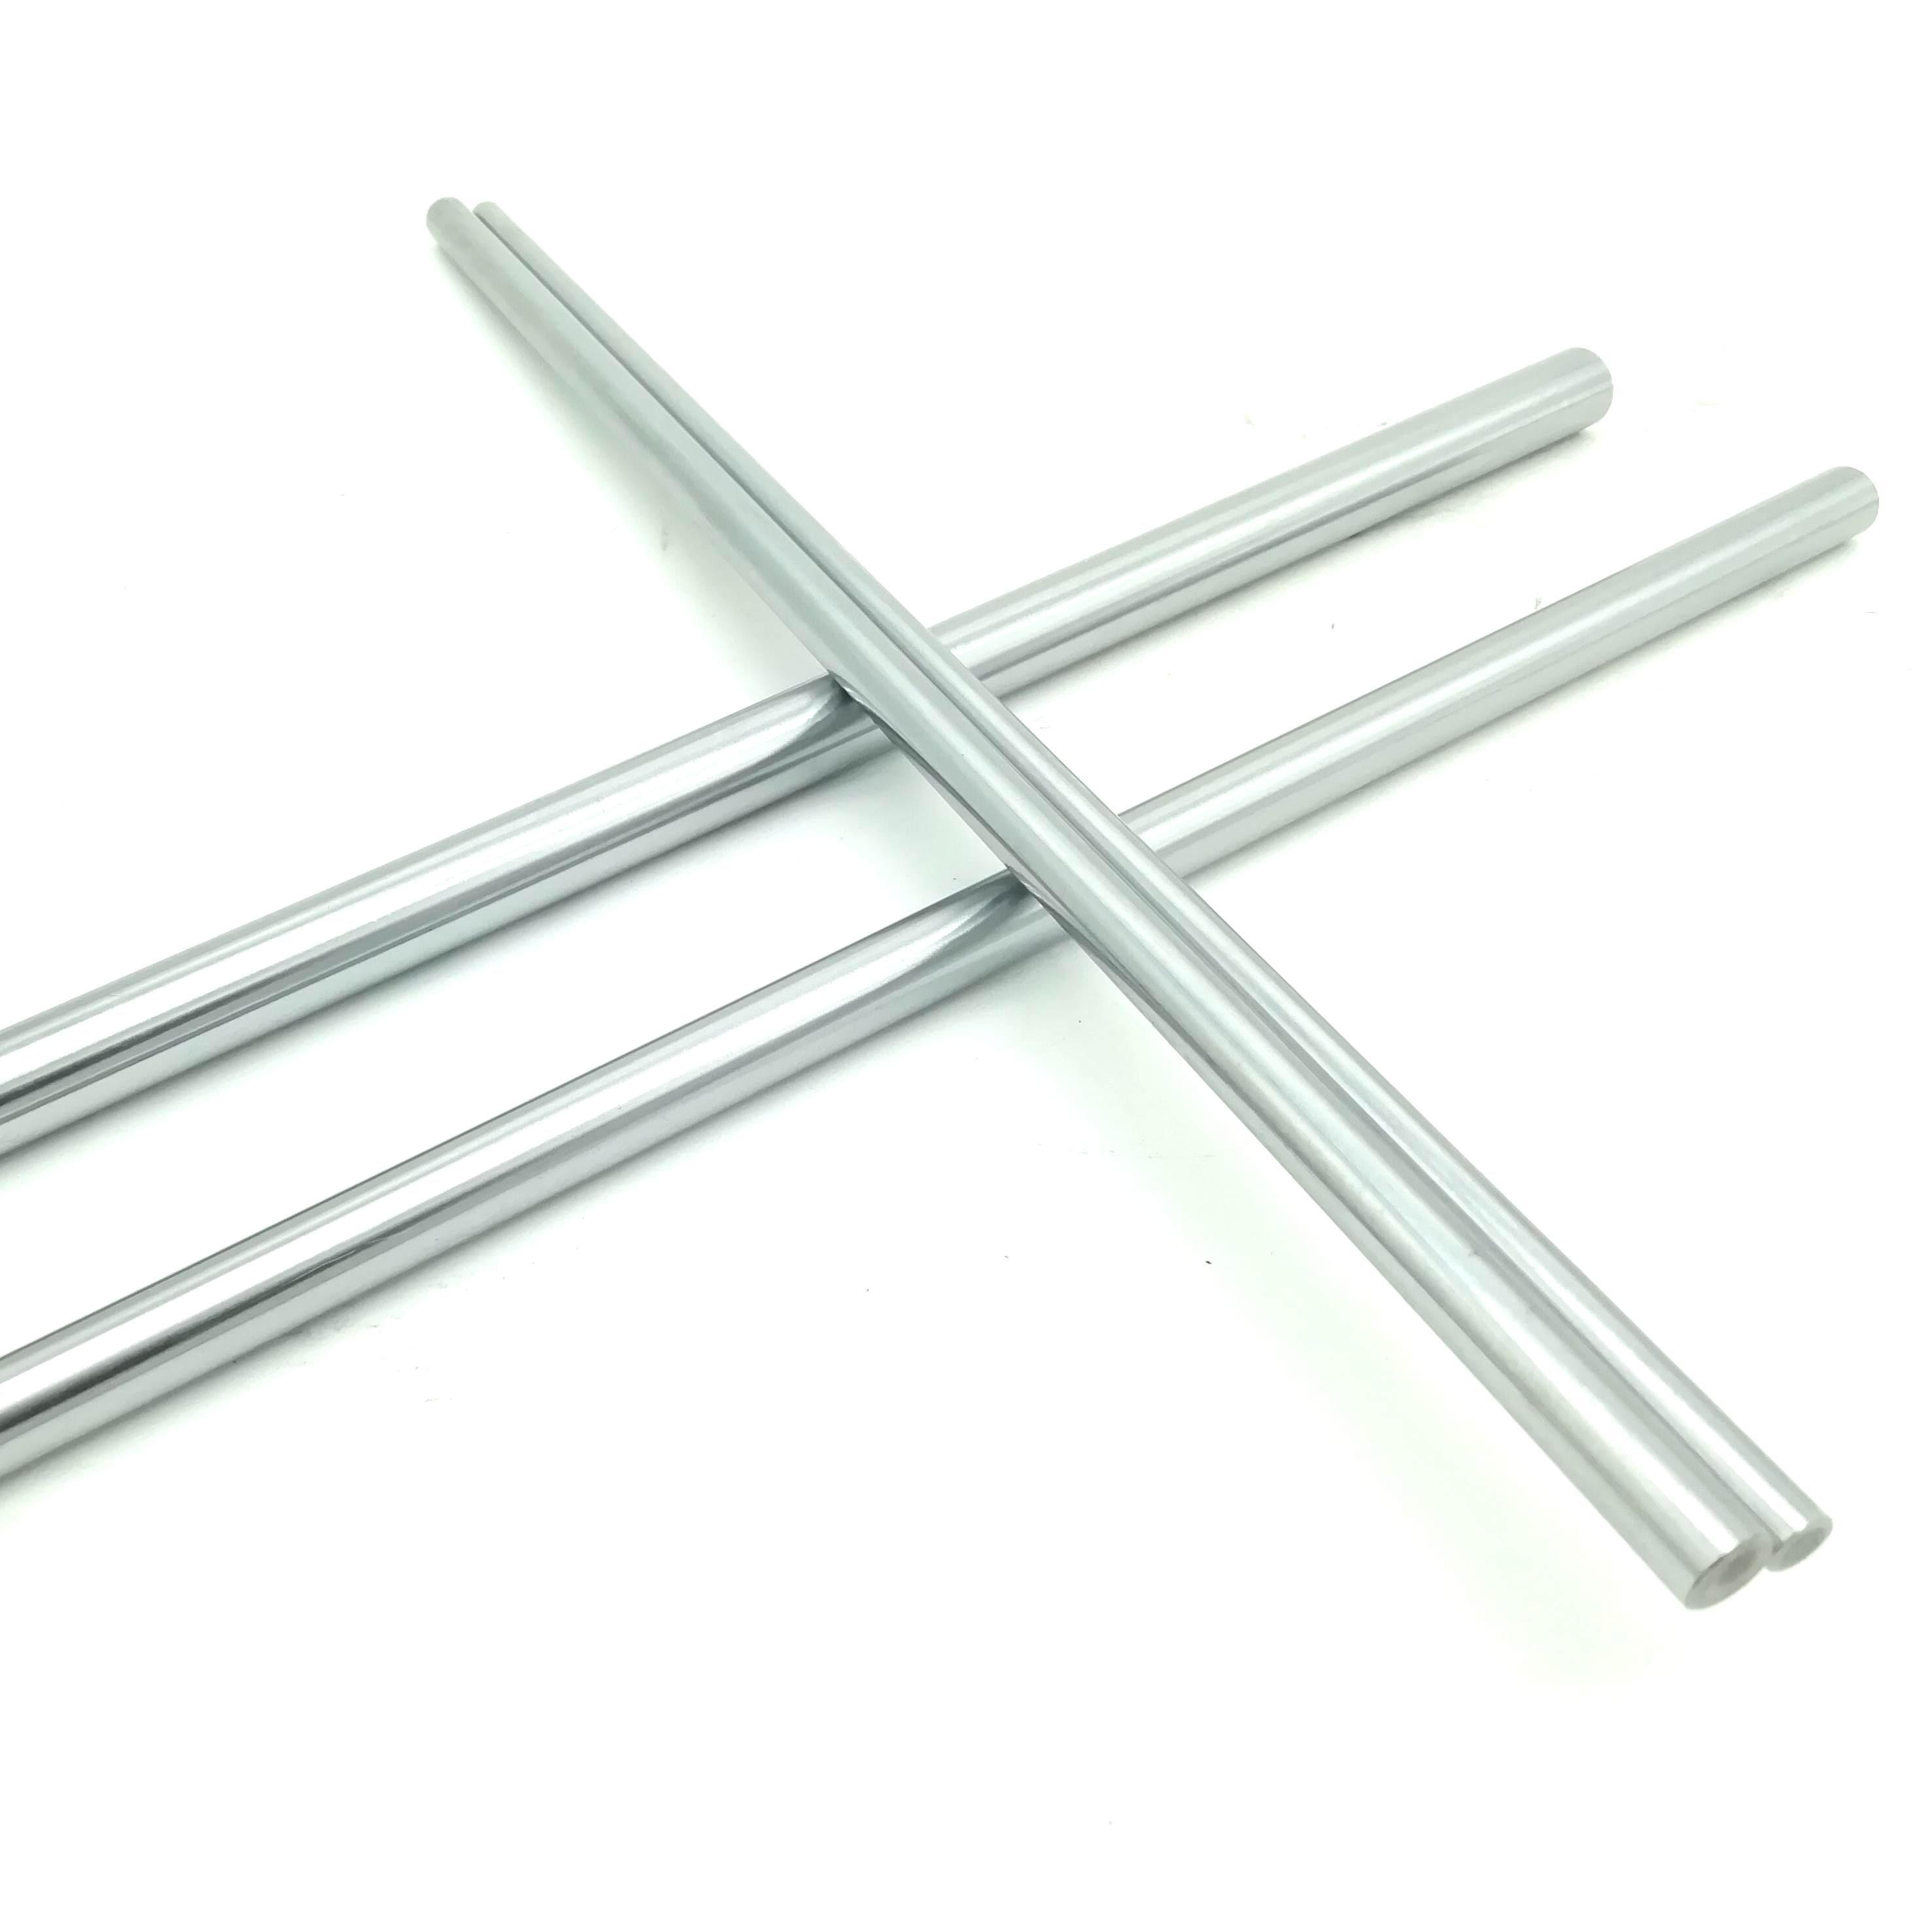 Hardened Steel Linear Shaft or Smooth Rod 8mm Diameter 200-500mm Length